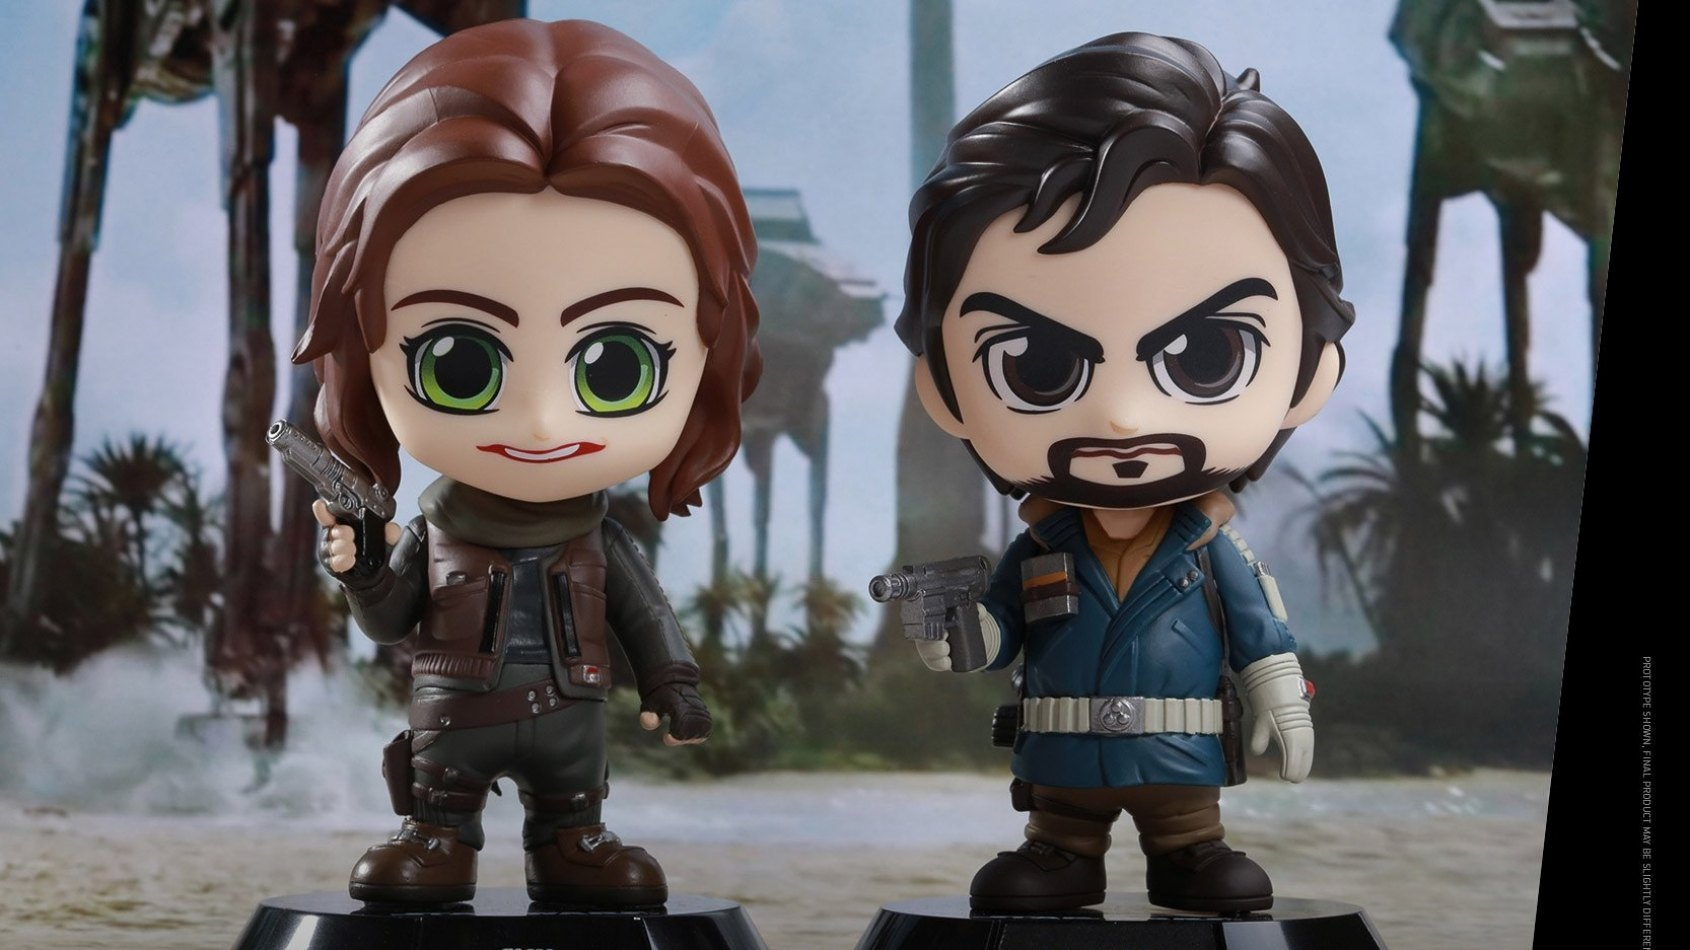 Rogue One: les bobble-head cosbaby de Jyn Erso et Cassian Andor